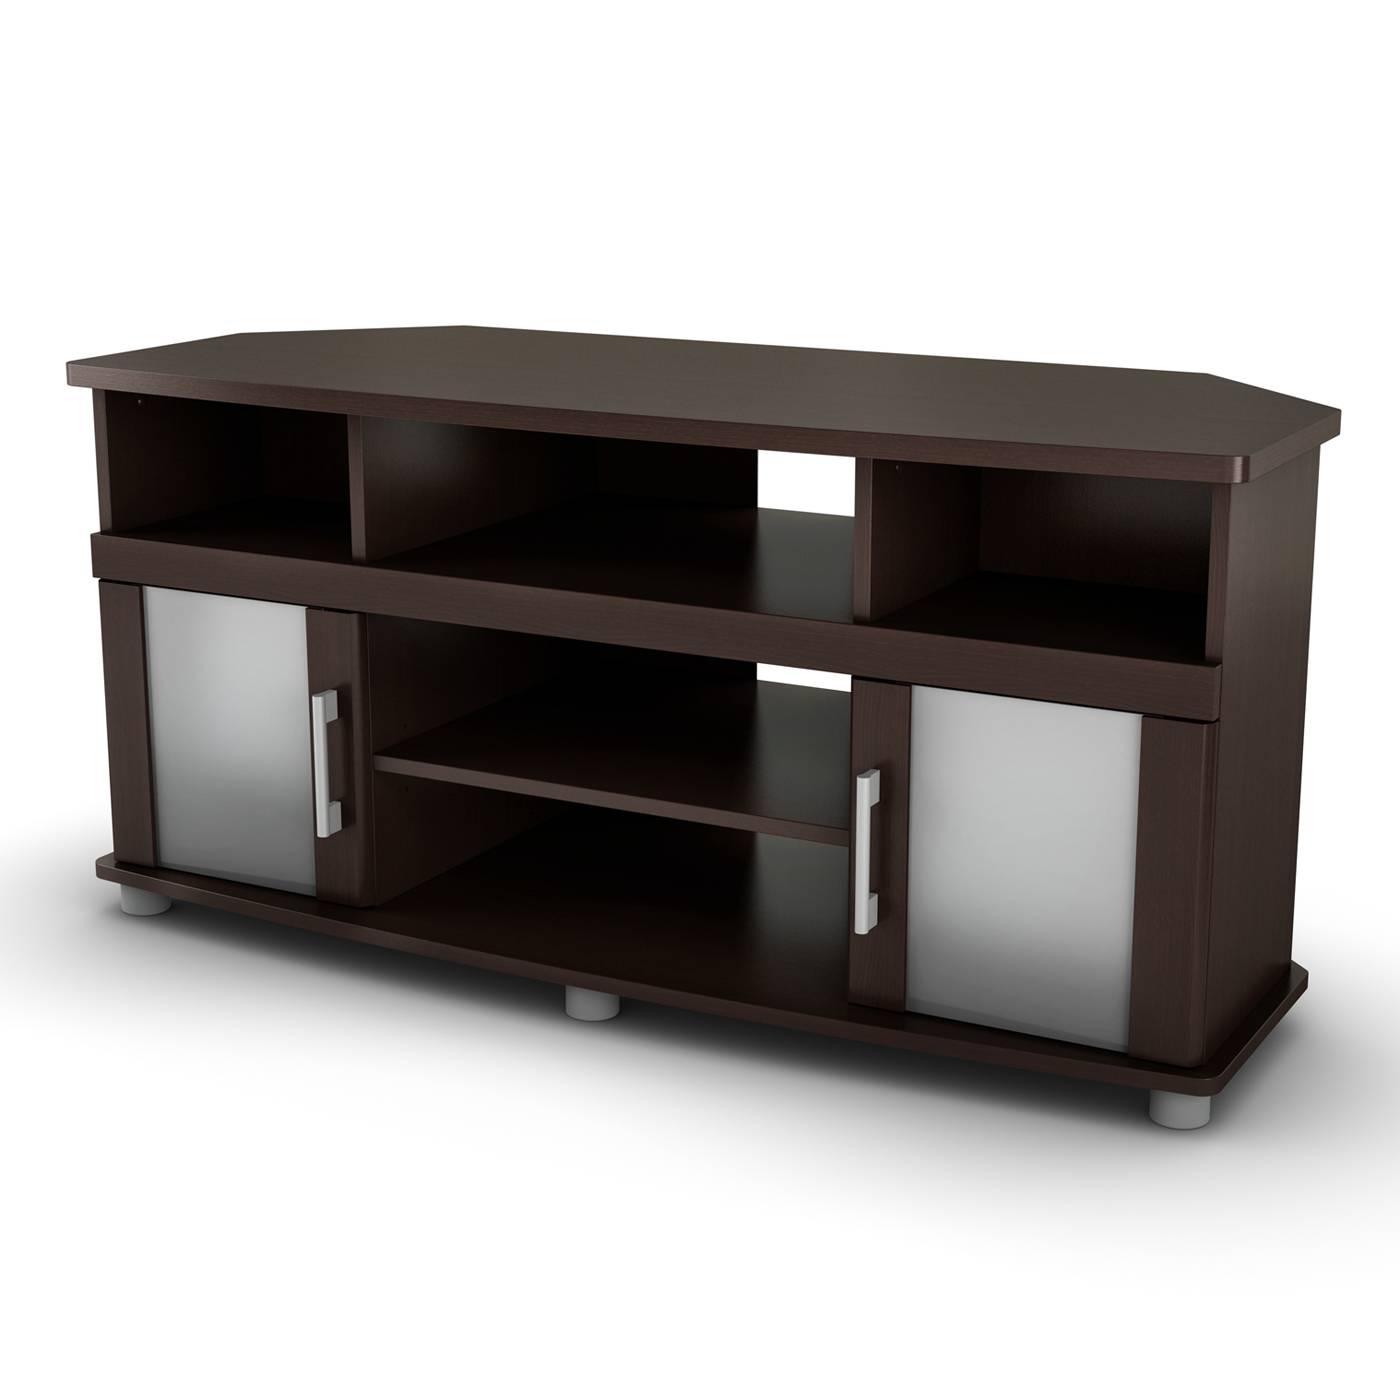 Bench. Tv Bench Toronto: Modern Tv Stands Lowes Furniture Toronto regarding Tv Stands Corner Units (Image 2 of 15)